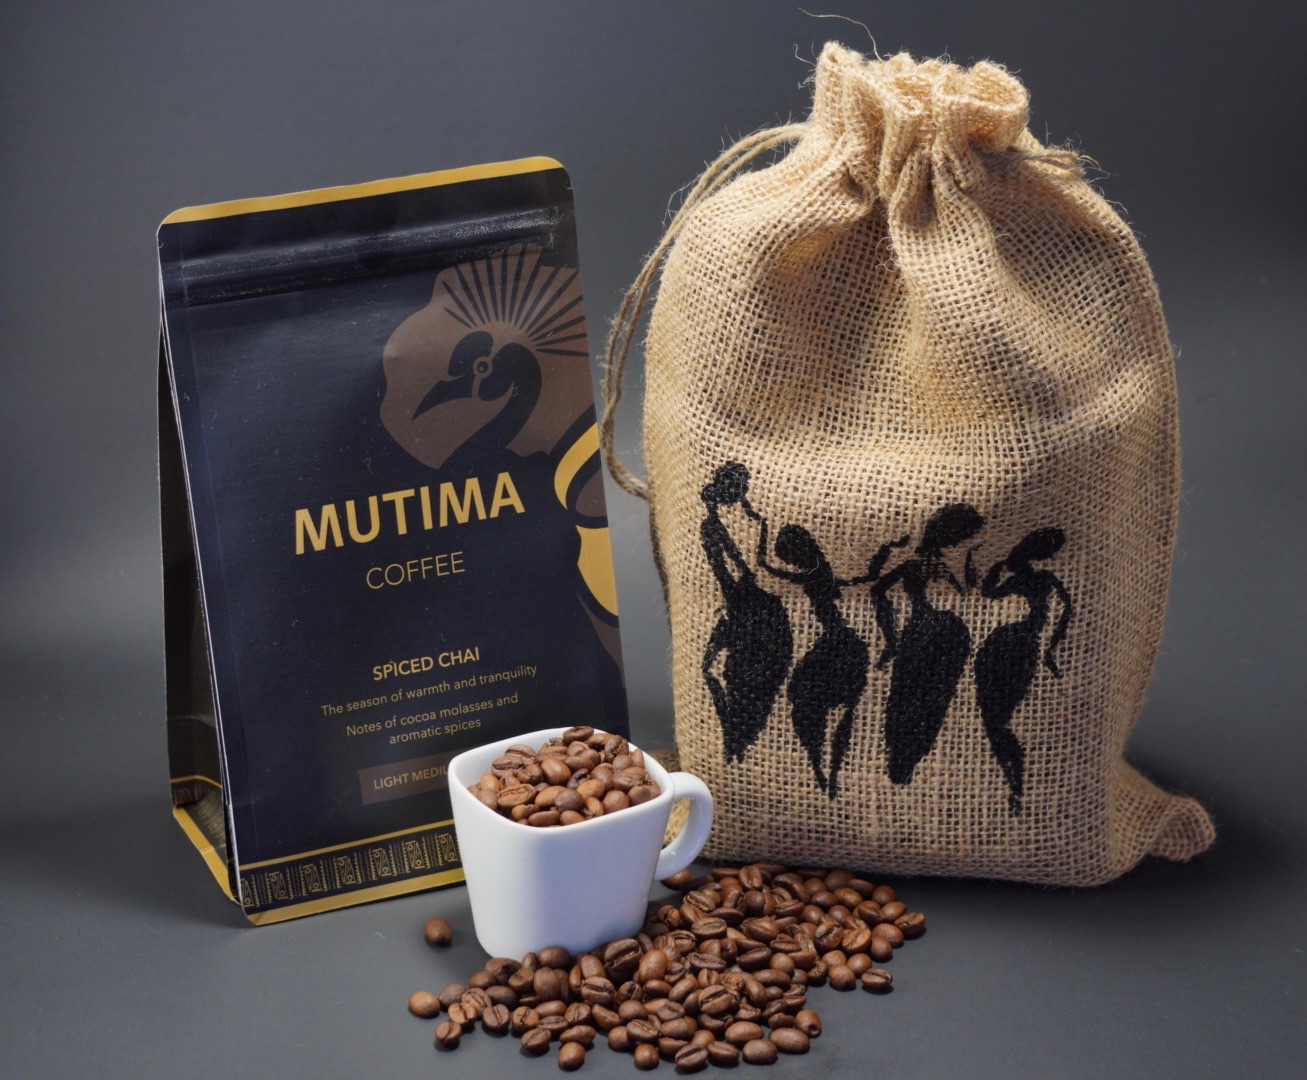 Mutima Coffee